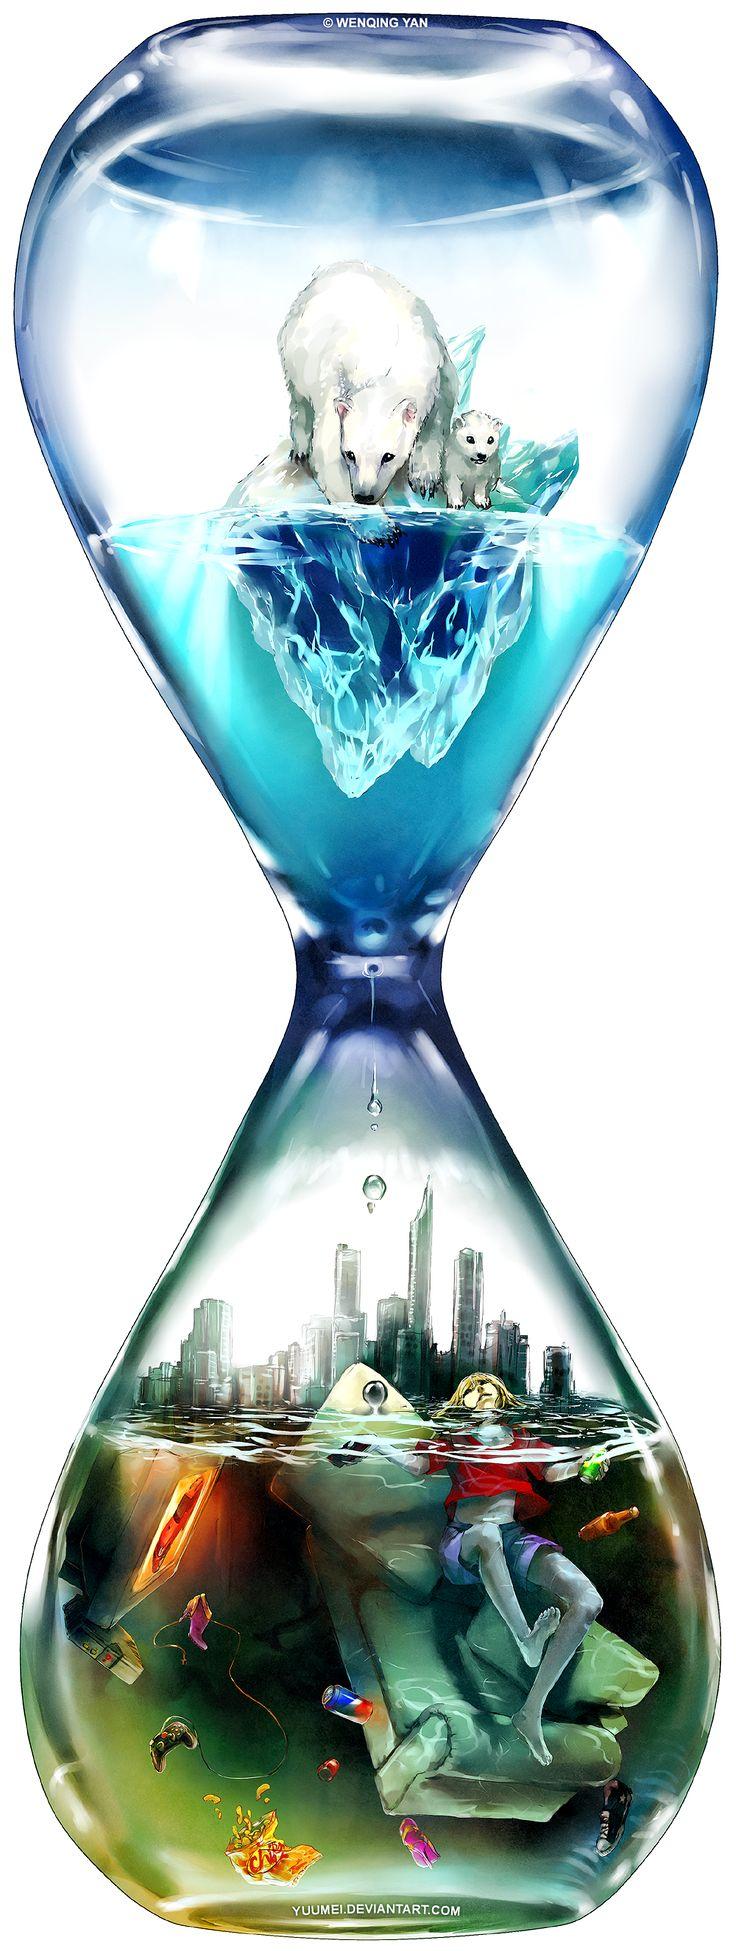 Countdown by yuumei.deviantart.com on @deviantART - Like my facebook: https://www.facebook.com/pages/Cool-Artwork/136281349874481